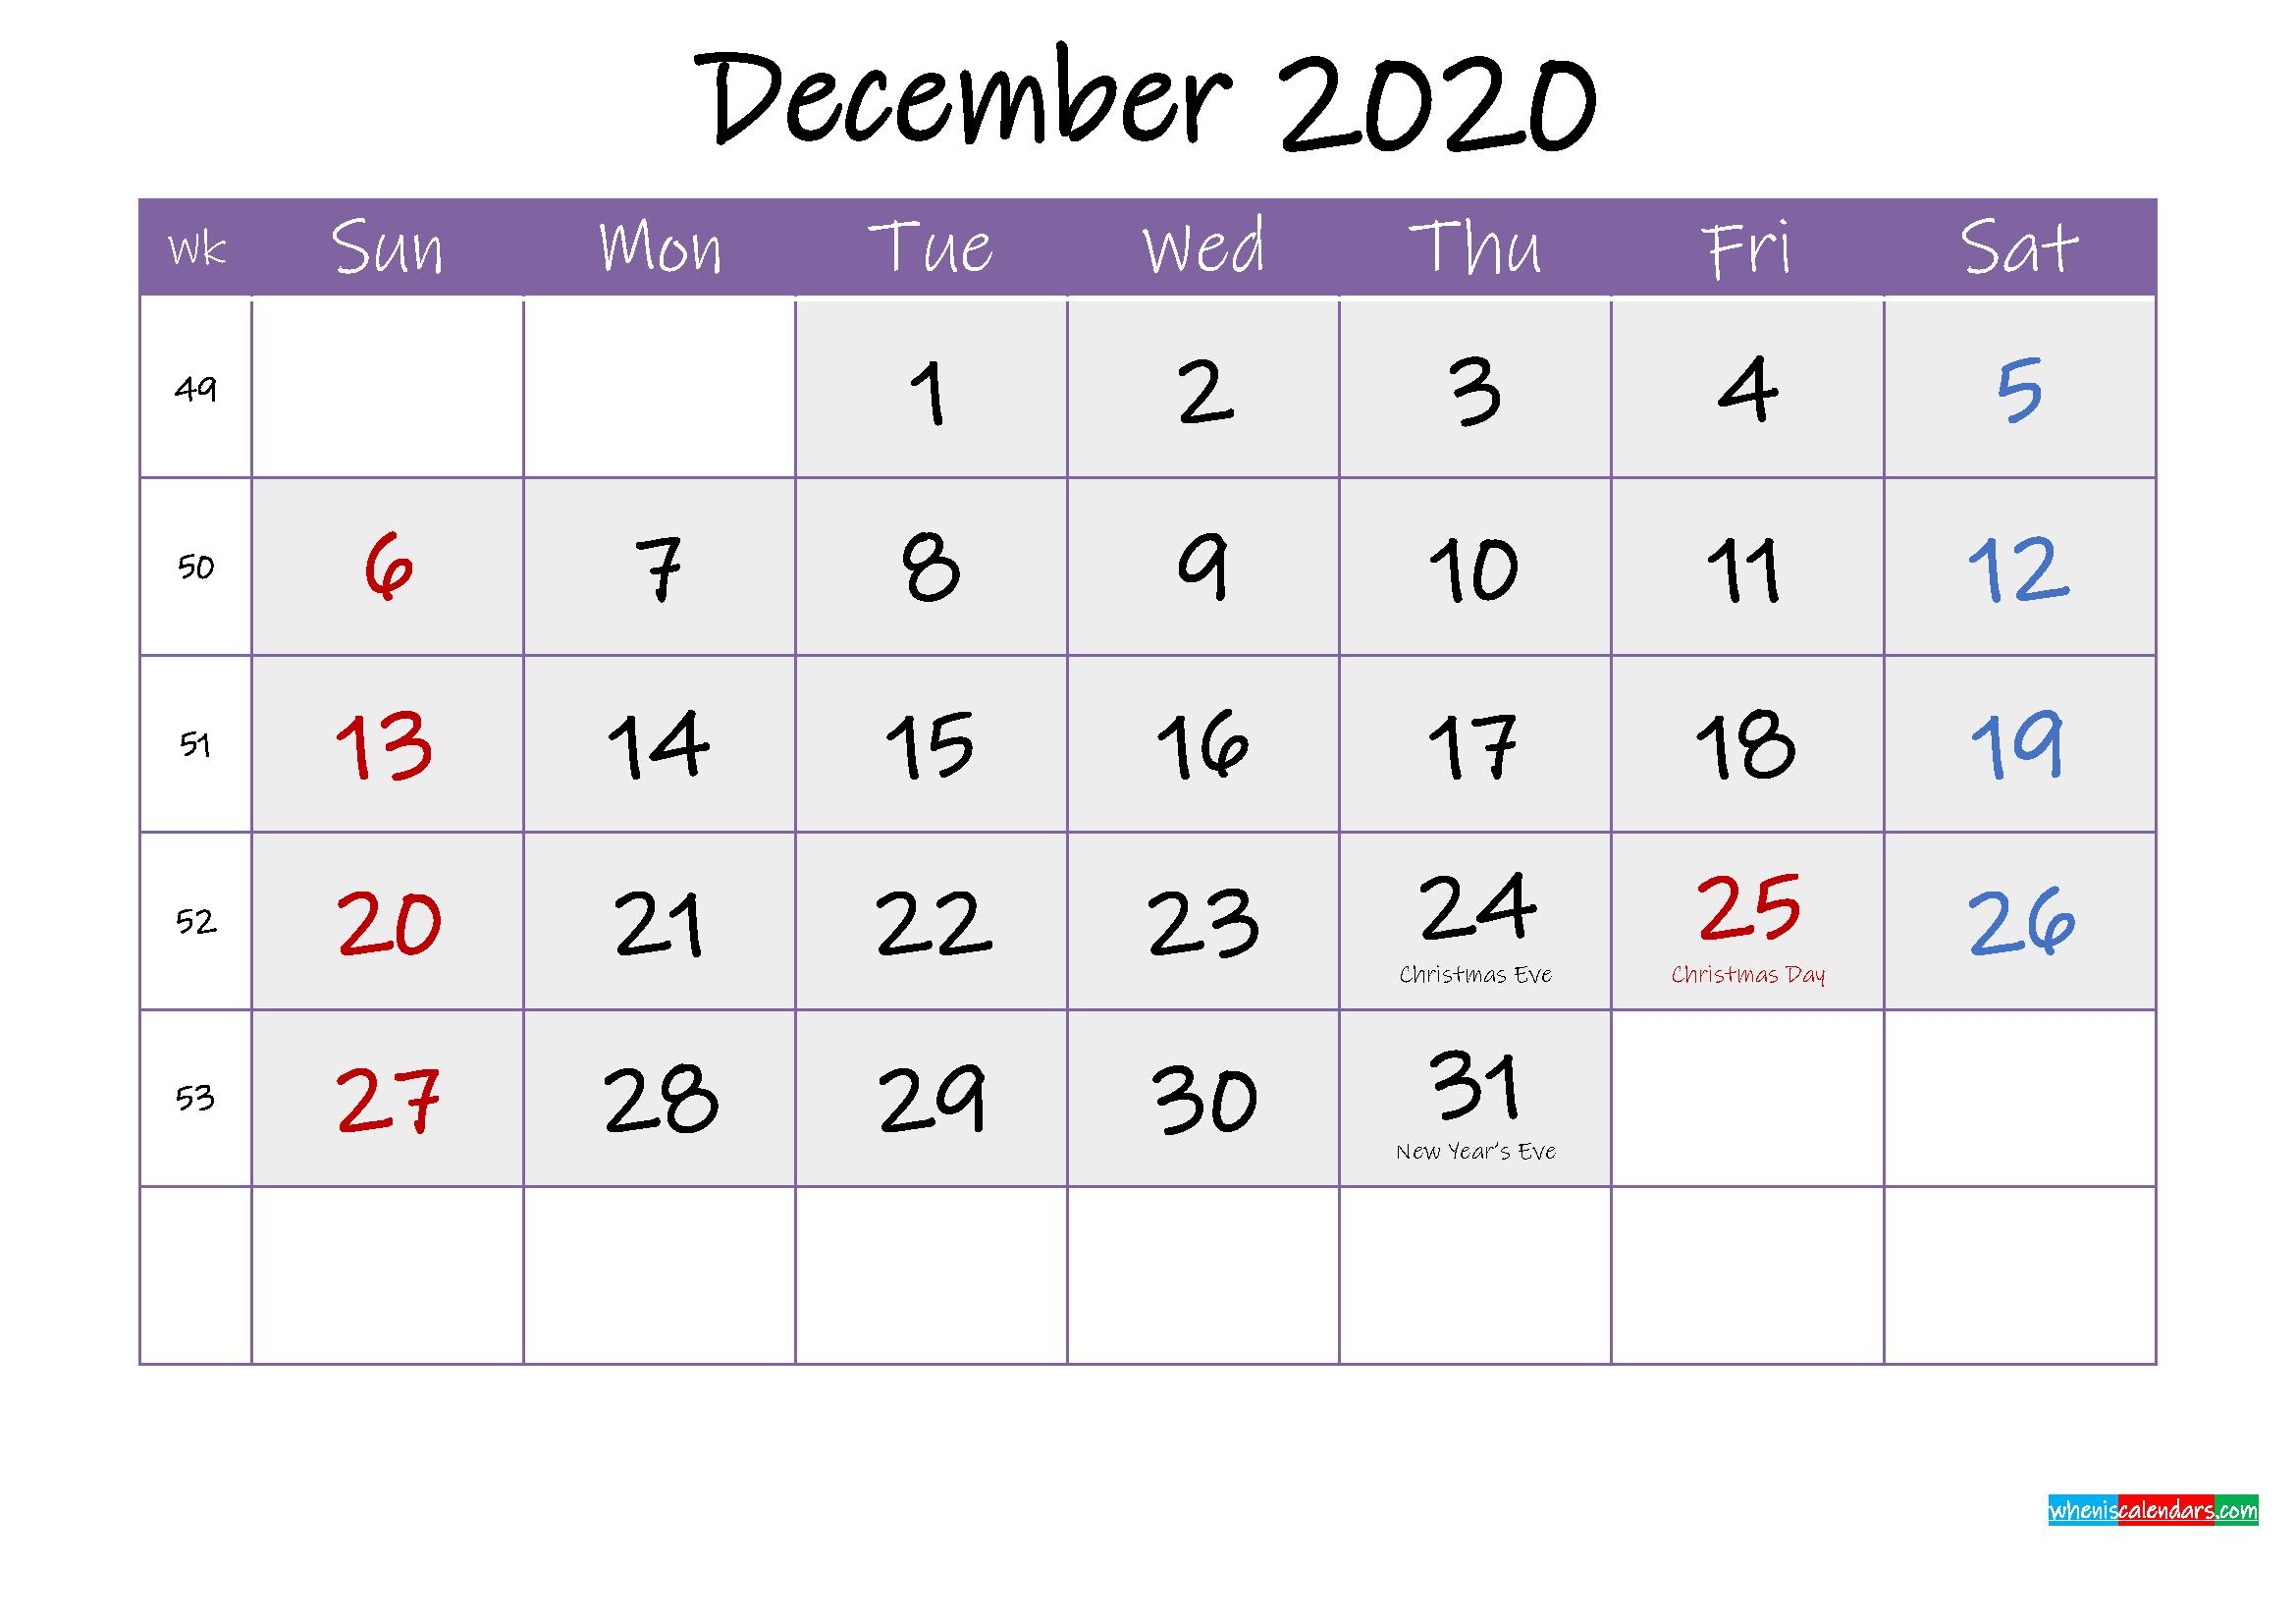 Free December 2020 Printable Calendar with Holidays